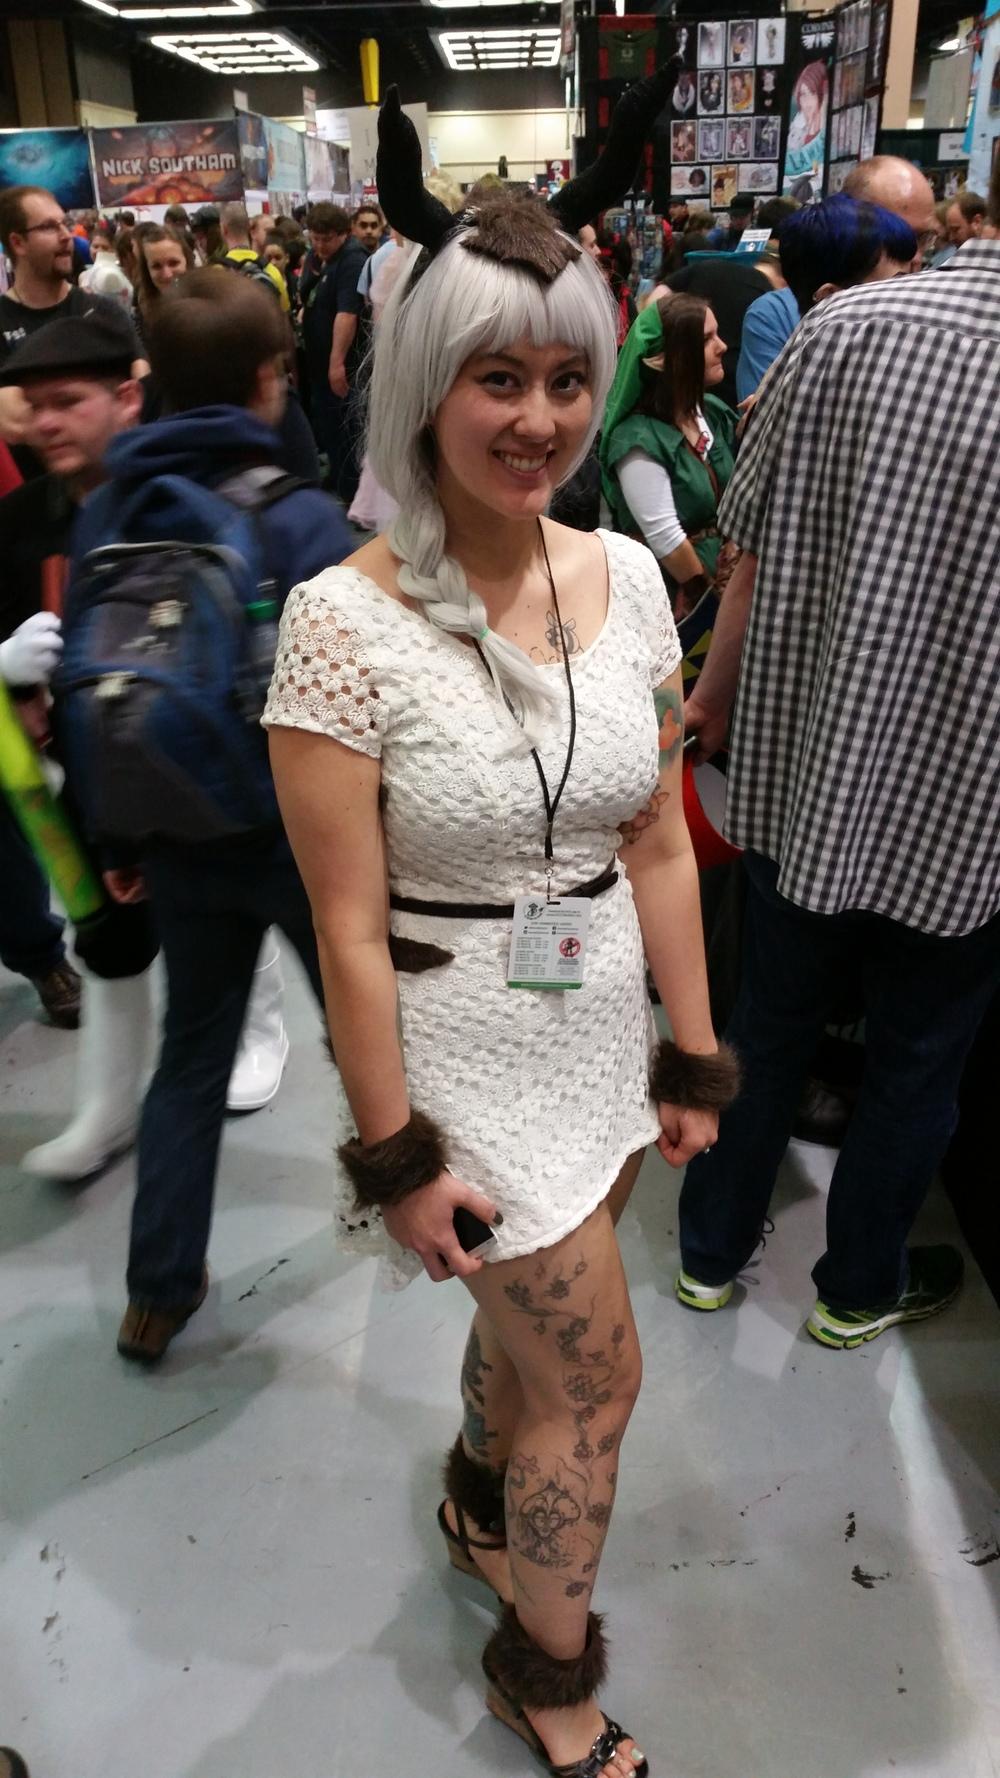 Cute #appa #cosplayer from #avatar at #ECCC #otaku #manga  #costumes